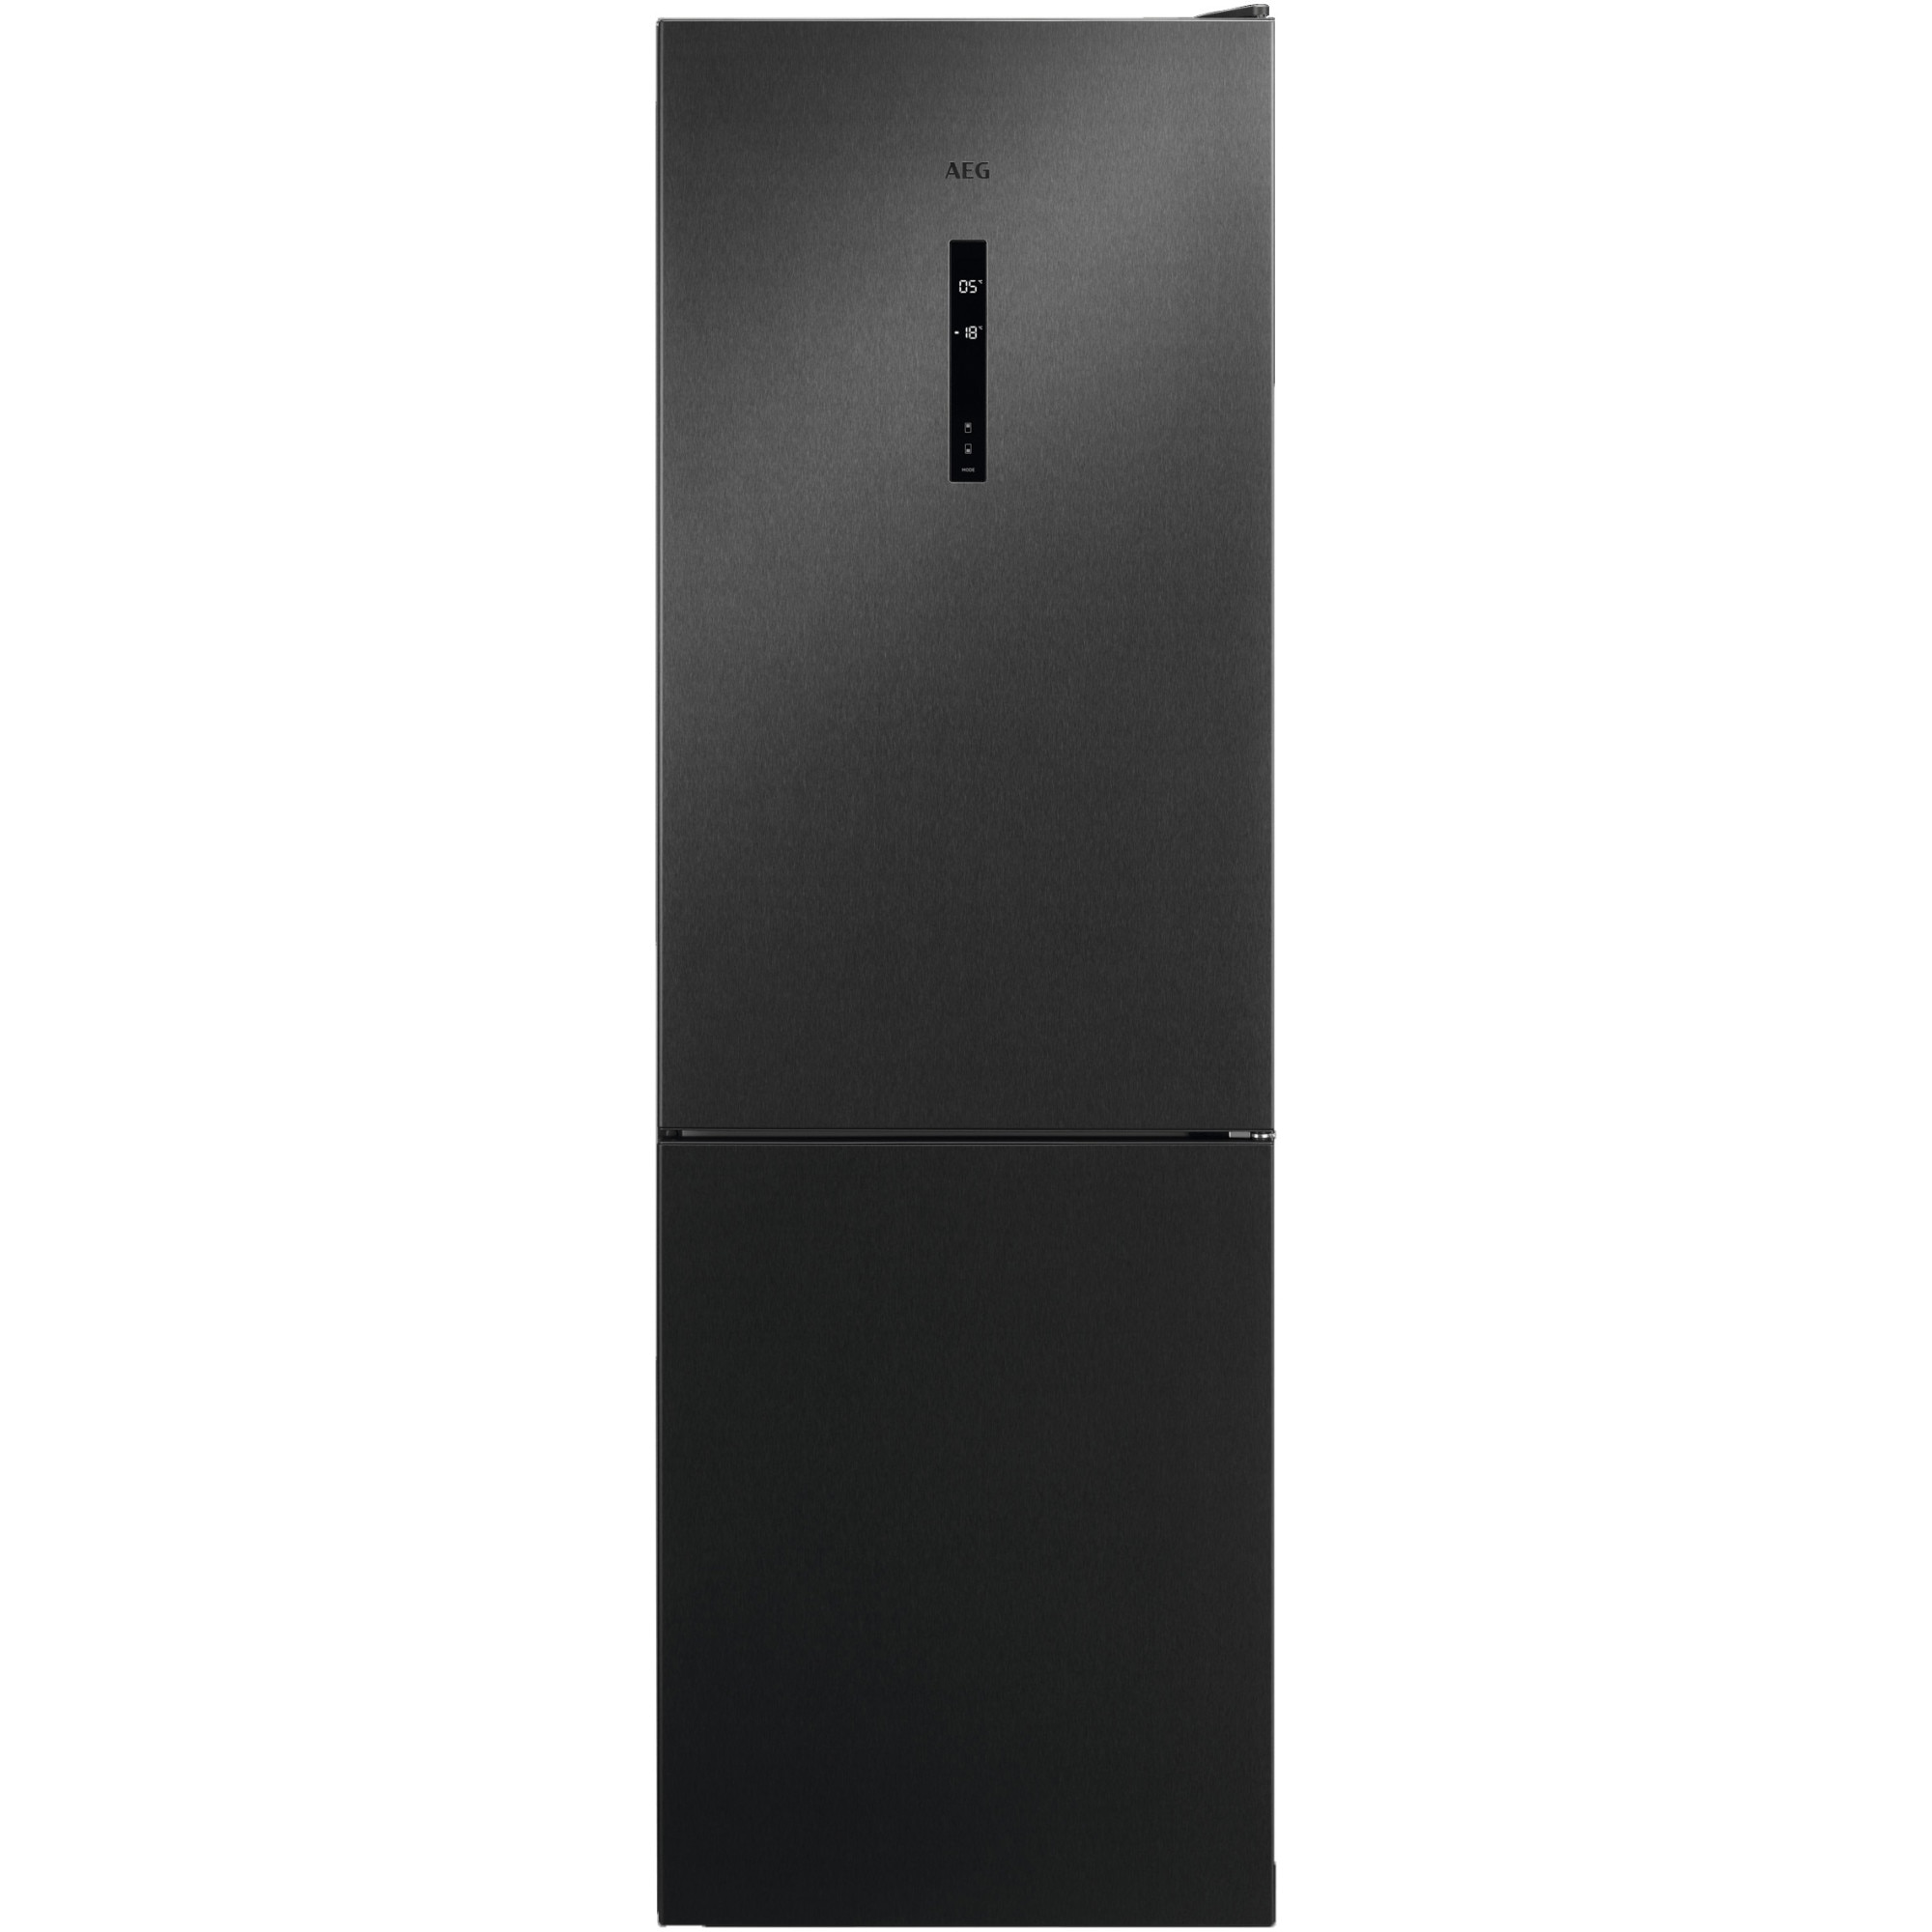 Fotografie Combina frigorifica AEG RCB732E5MB, 324 l, NoFrost, Display, Clasa E, H 186 cm, Inox negru